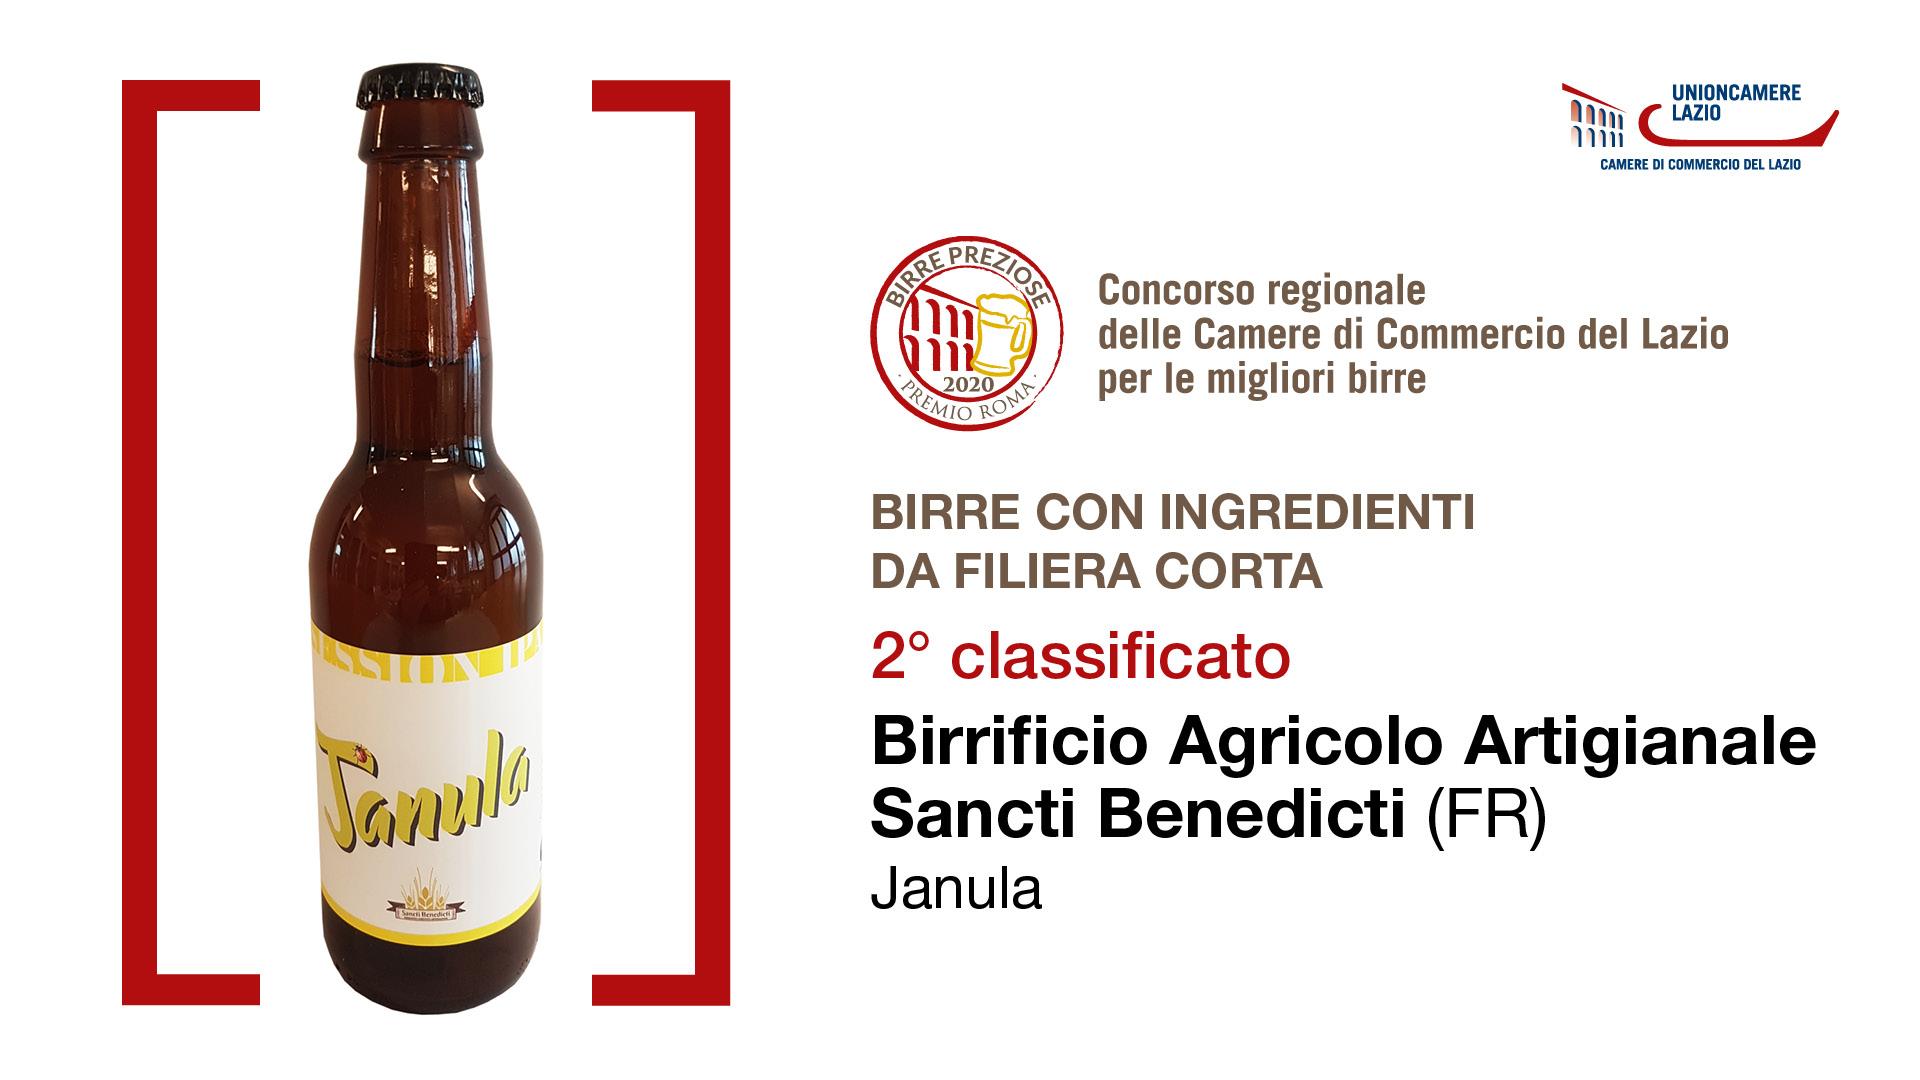 Birrificio Agricolo Artigianale Sancti Benedicti (FR)